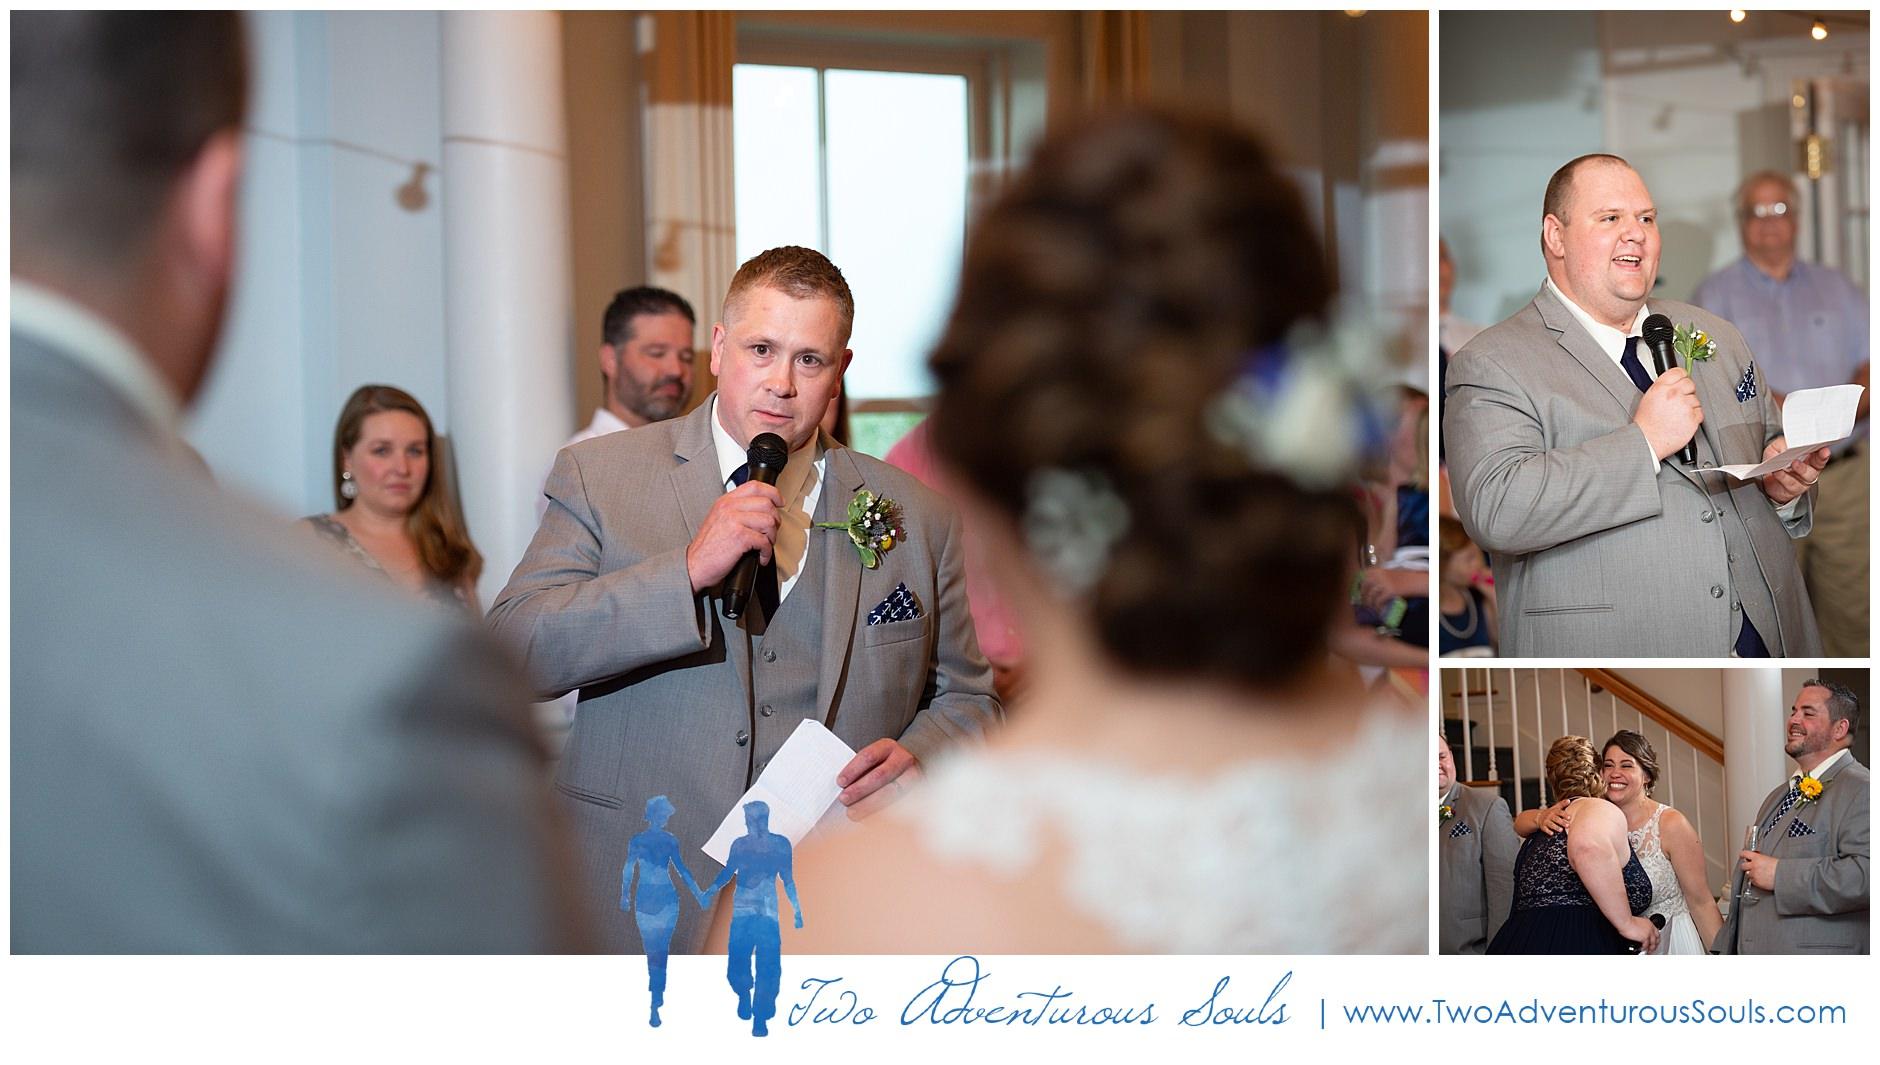 Maine Wedding Photographers, SMCC Wedding Photographers, Southern Maine Community College Wedding Photographers, Two Adventurous Souls-AshleyAaron_0038.jpg